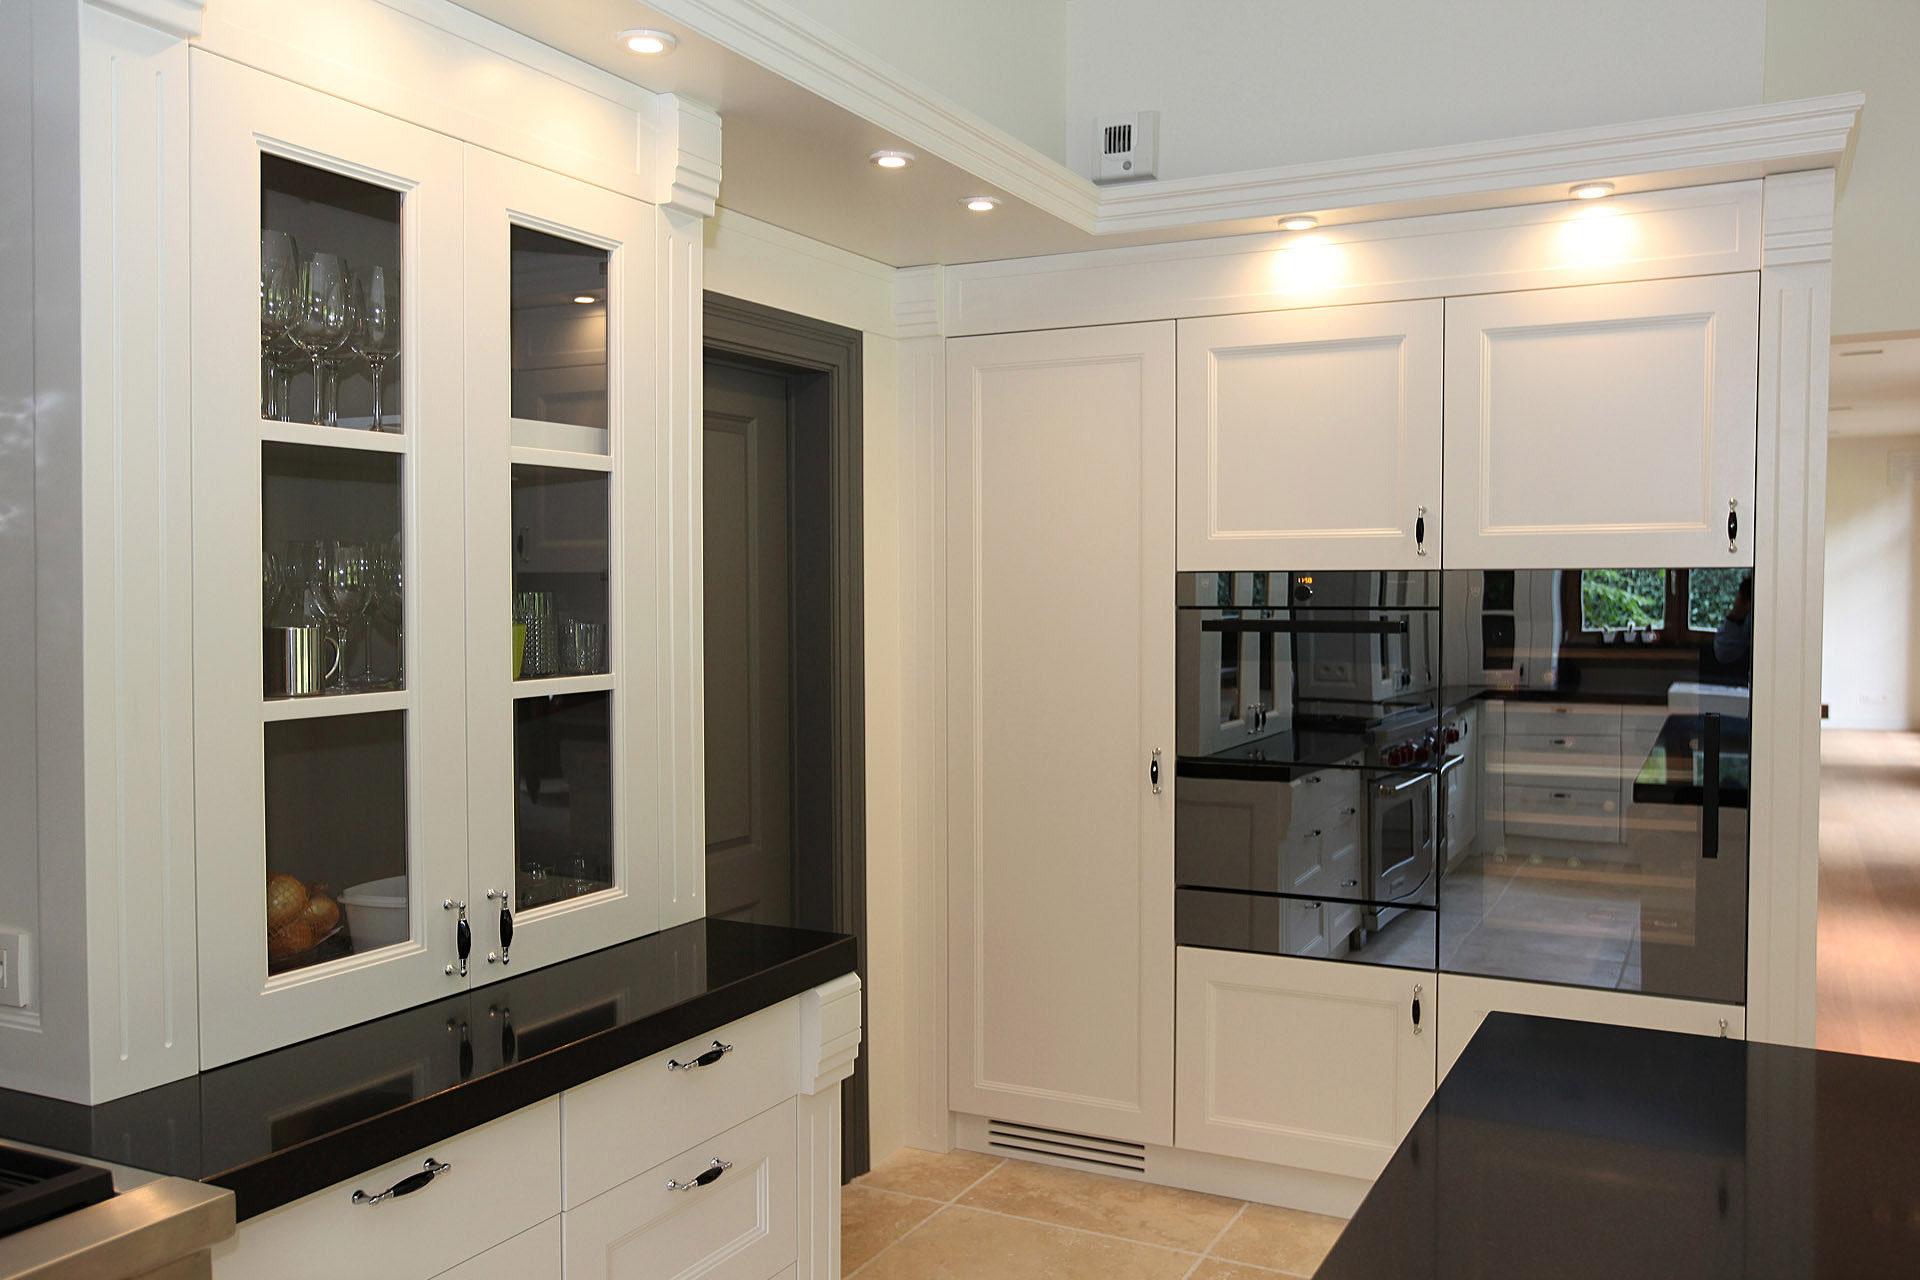 House Design Keuken : Kitchen marcotte style